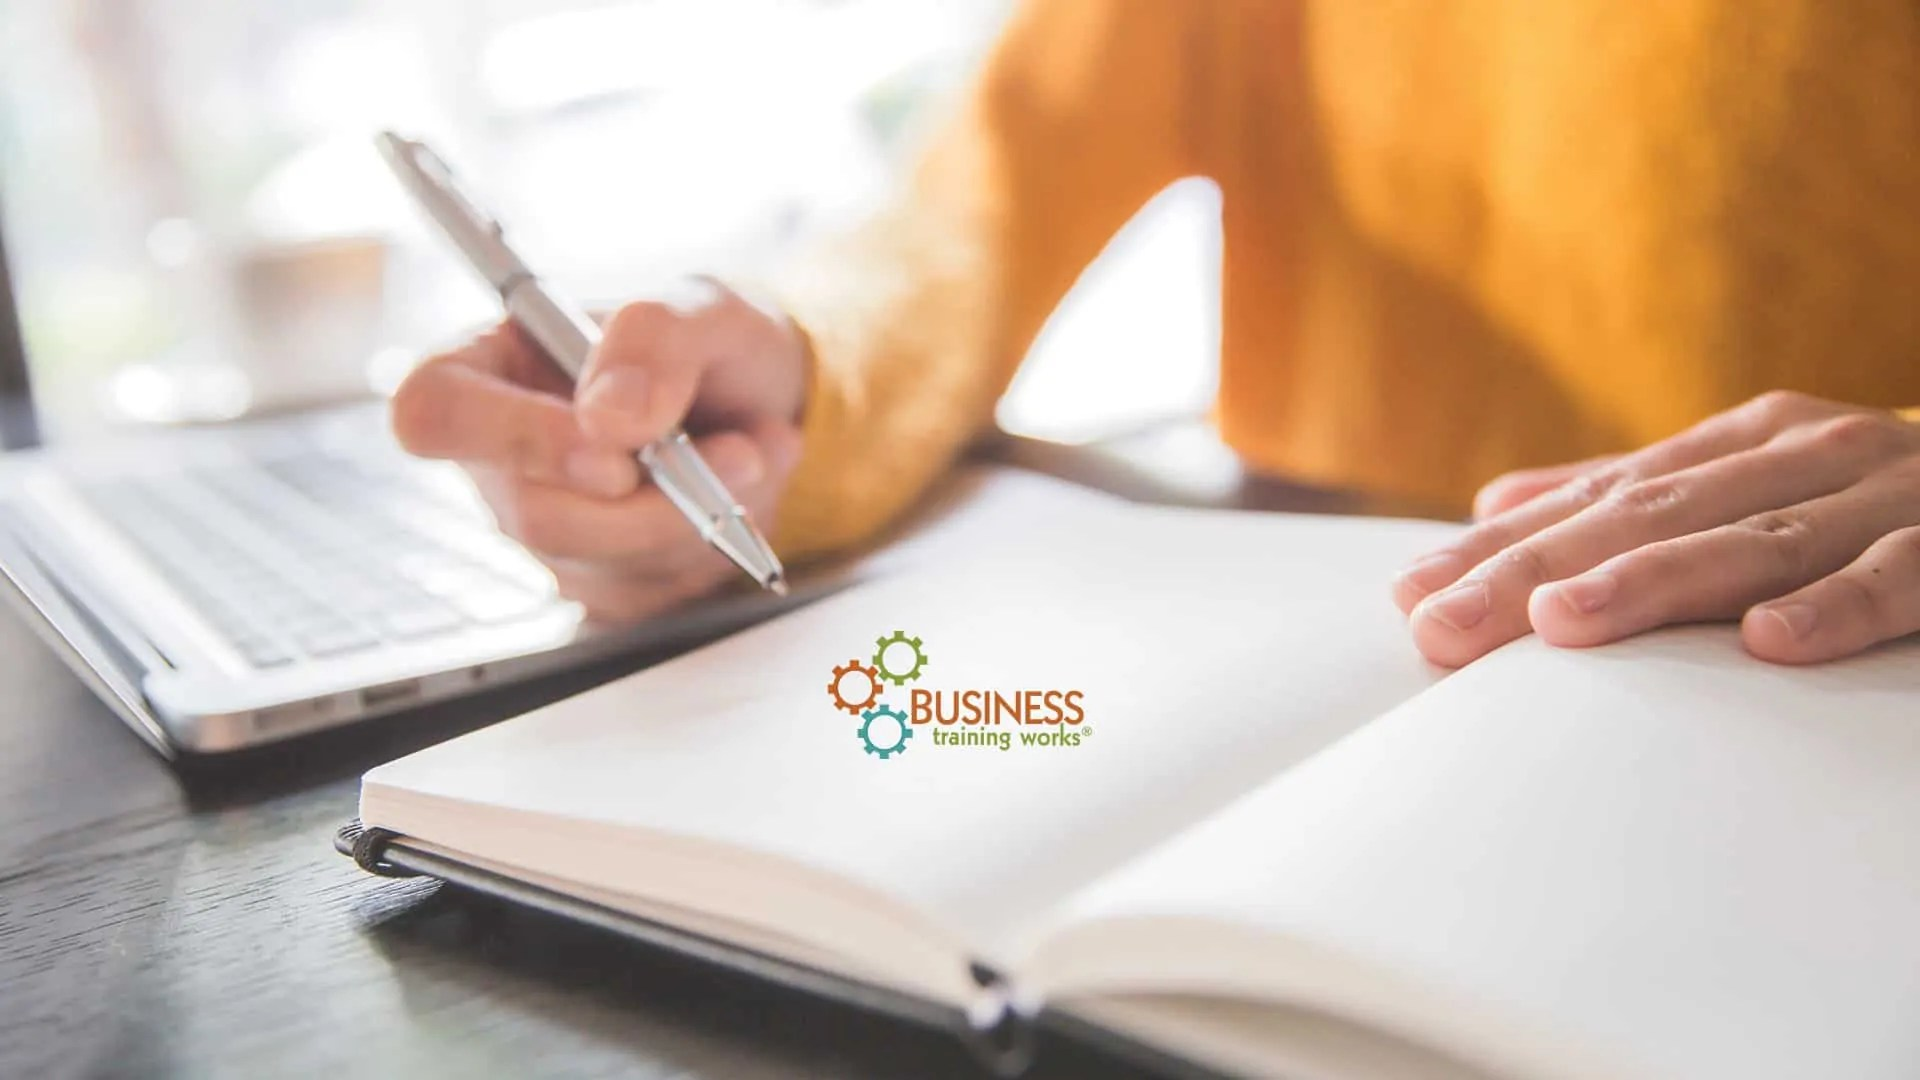 Online Project Management Course for IT Professionals